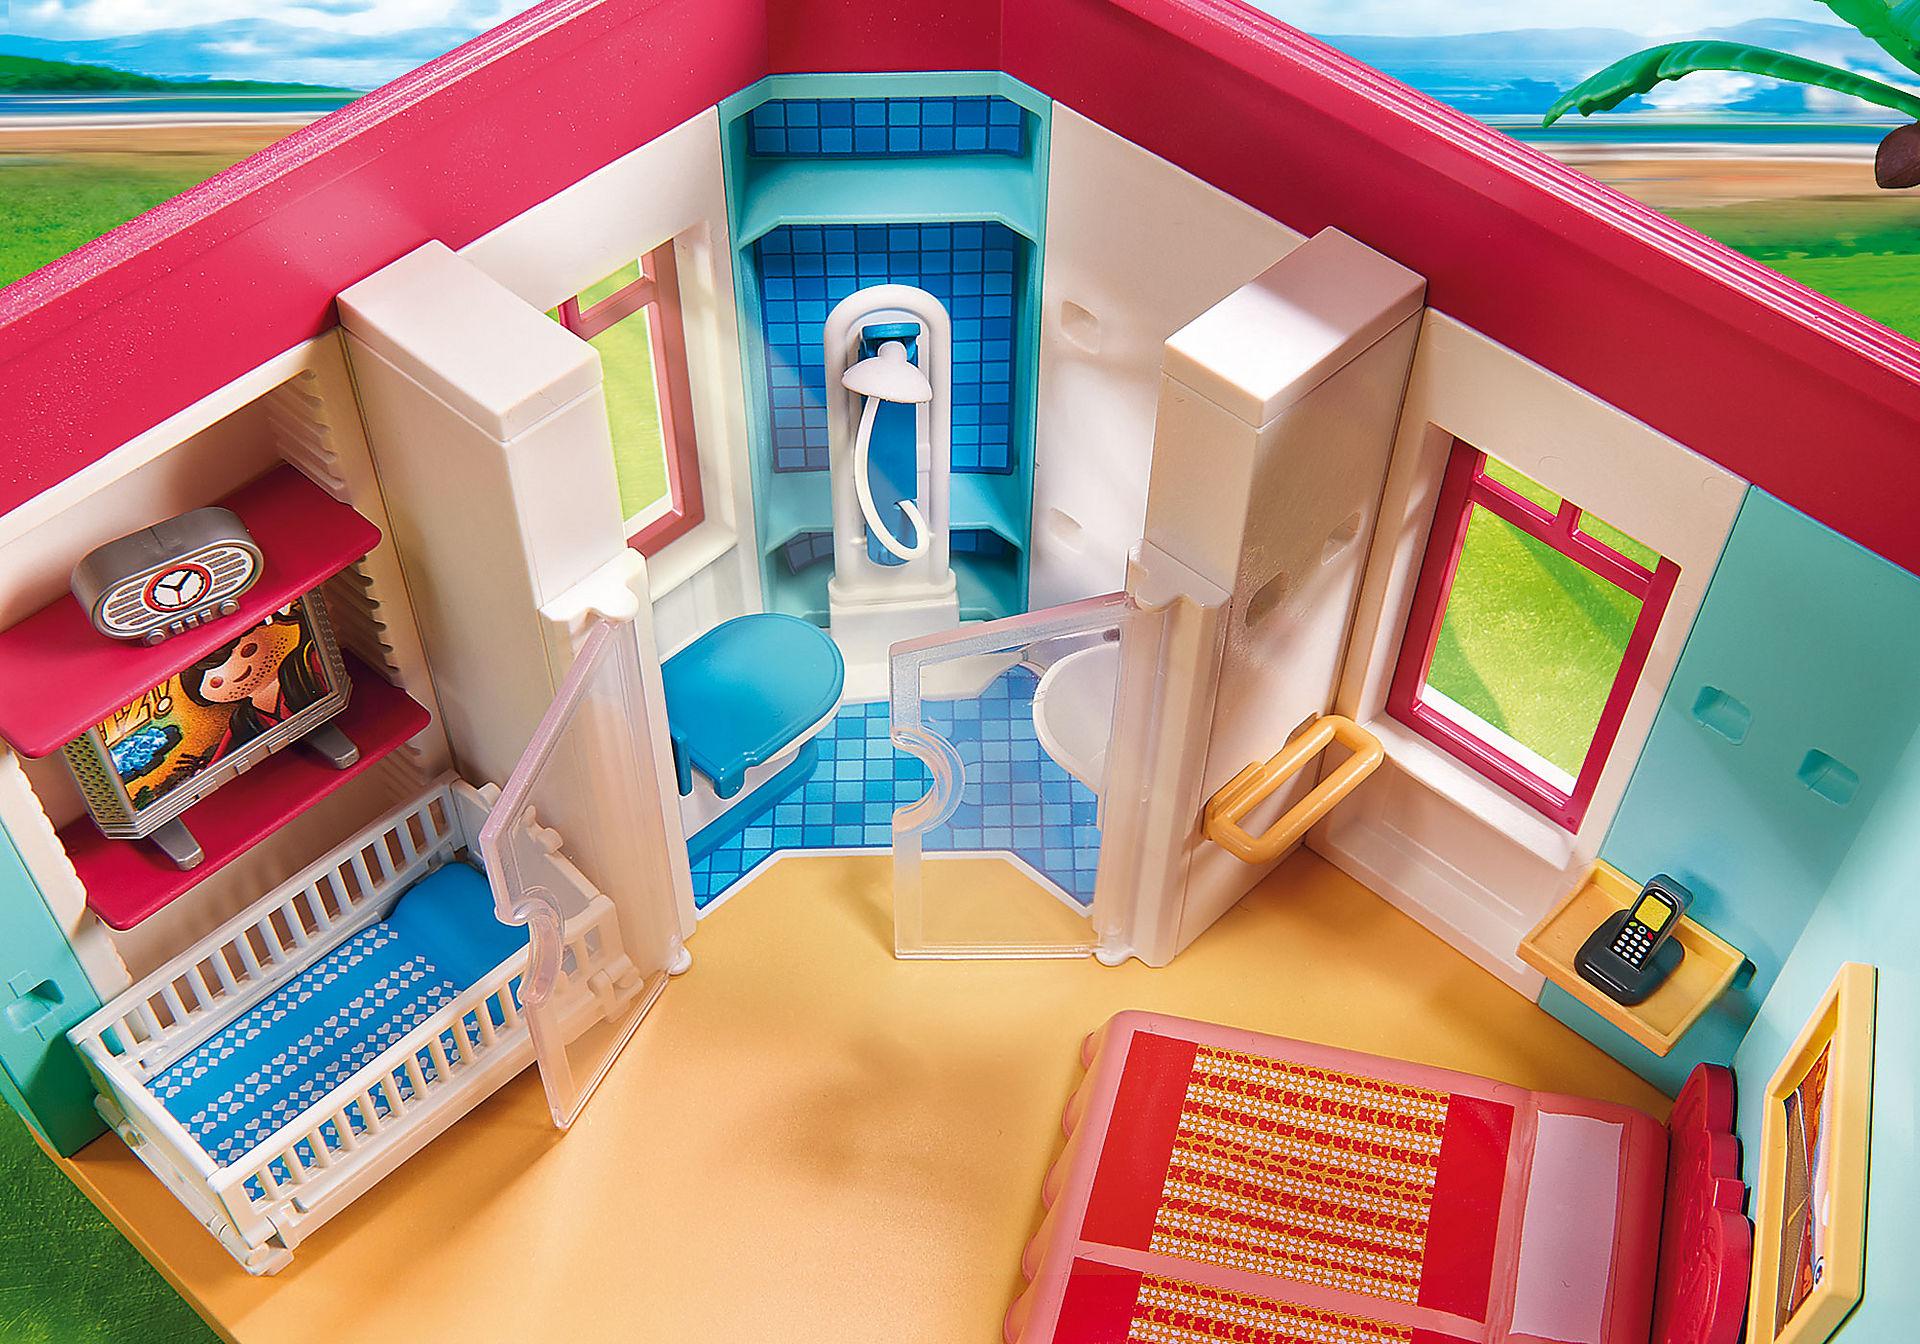 9539 Playmobil Inn zoom image7